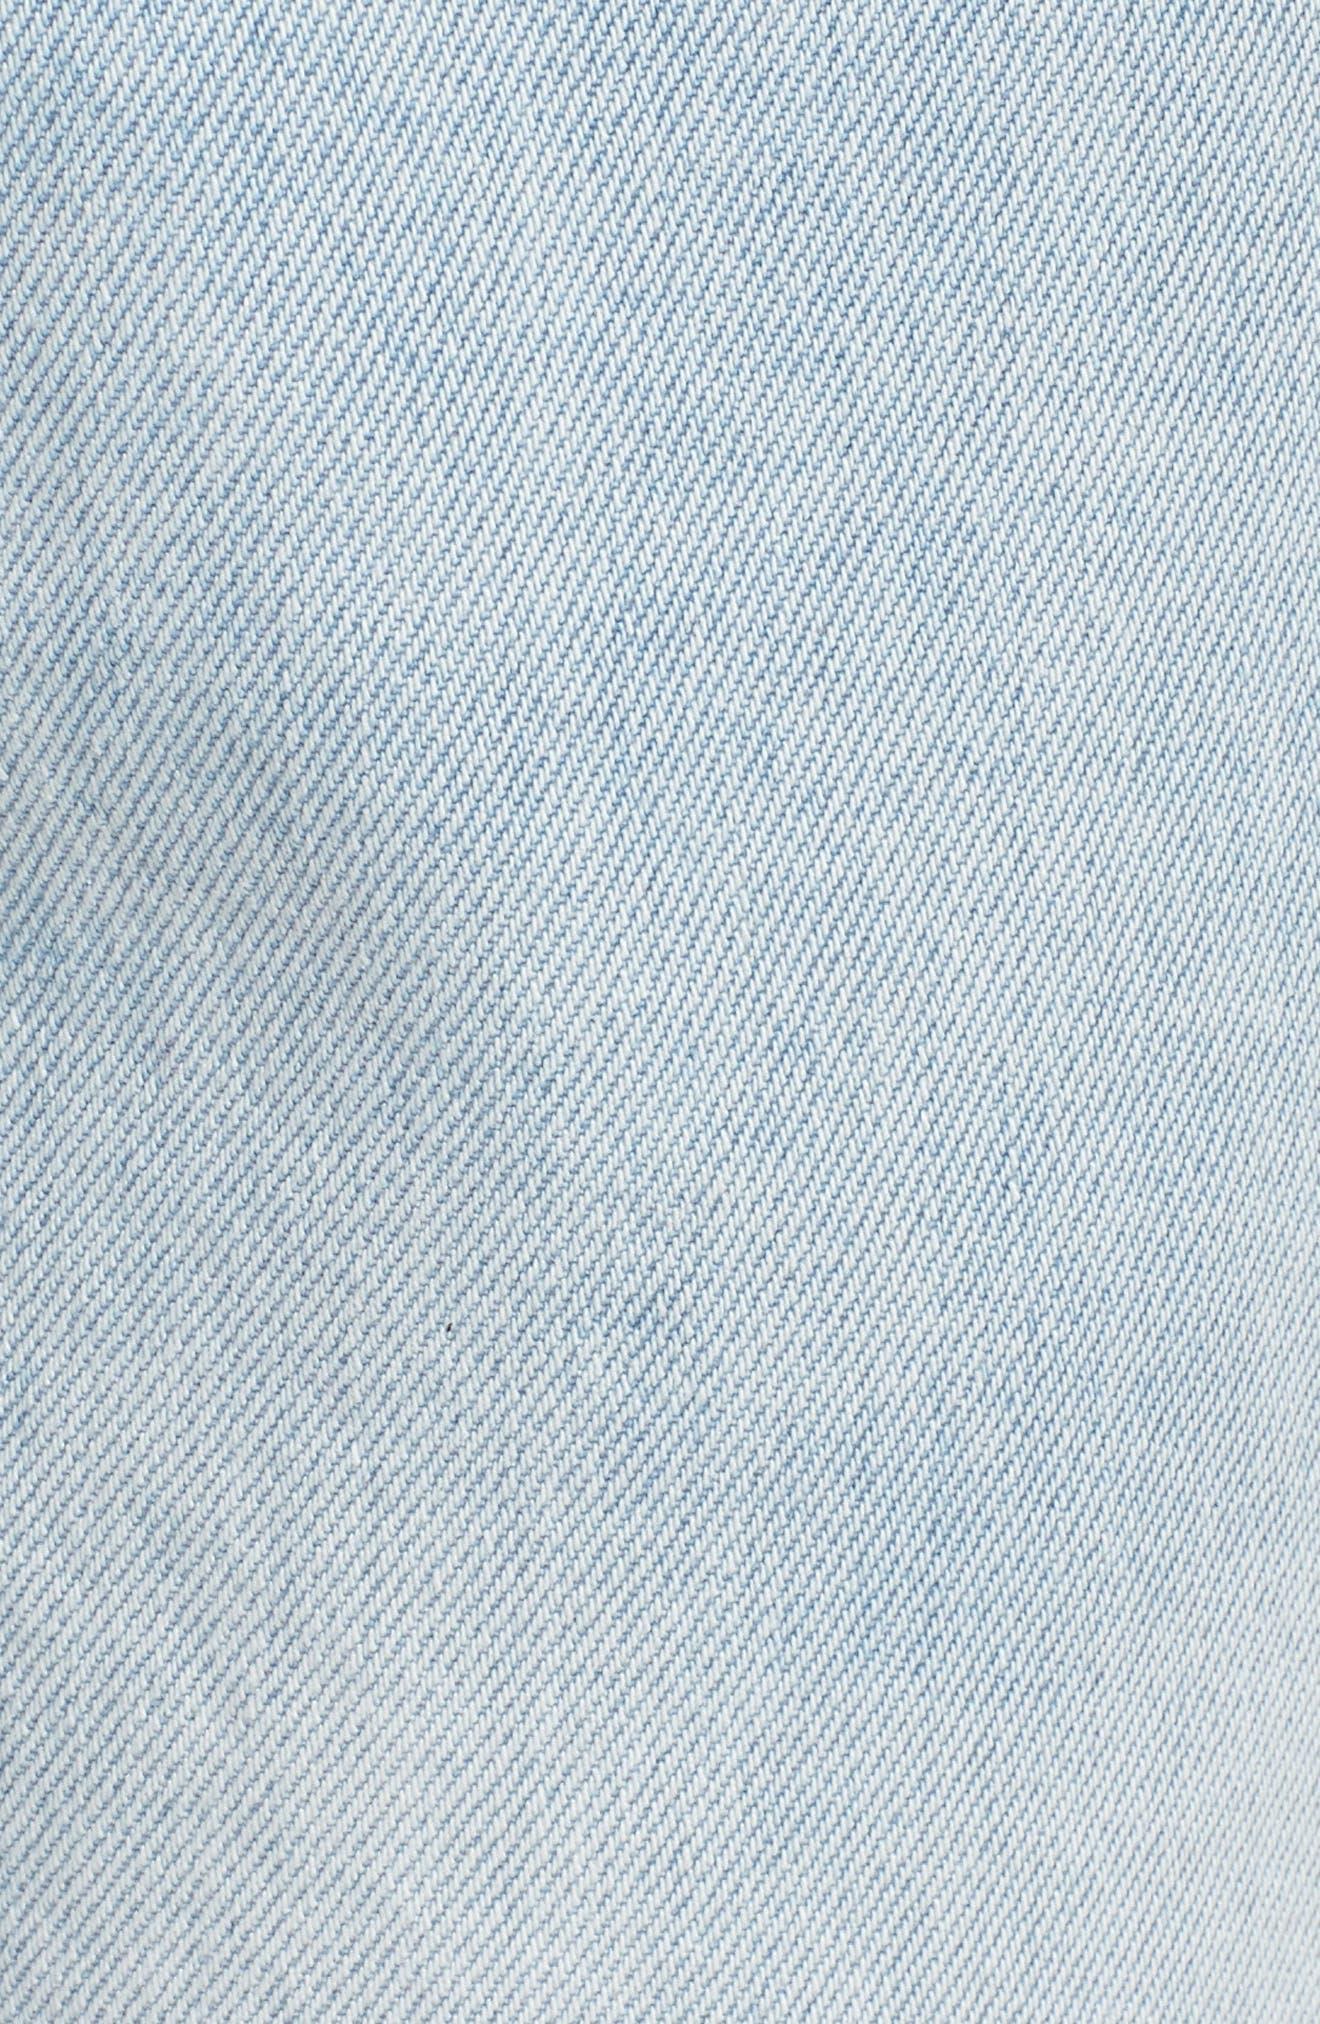 Stevie Ripped Crop Slim Boyfriend Jeans,                             Alternate thumbnail 6, color,                             Drift